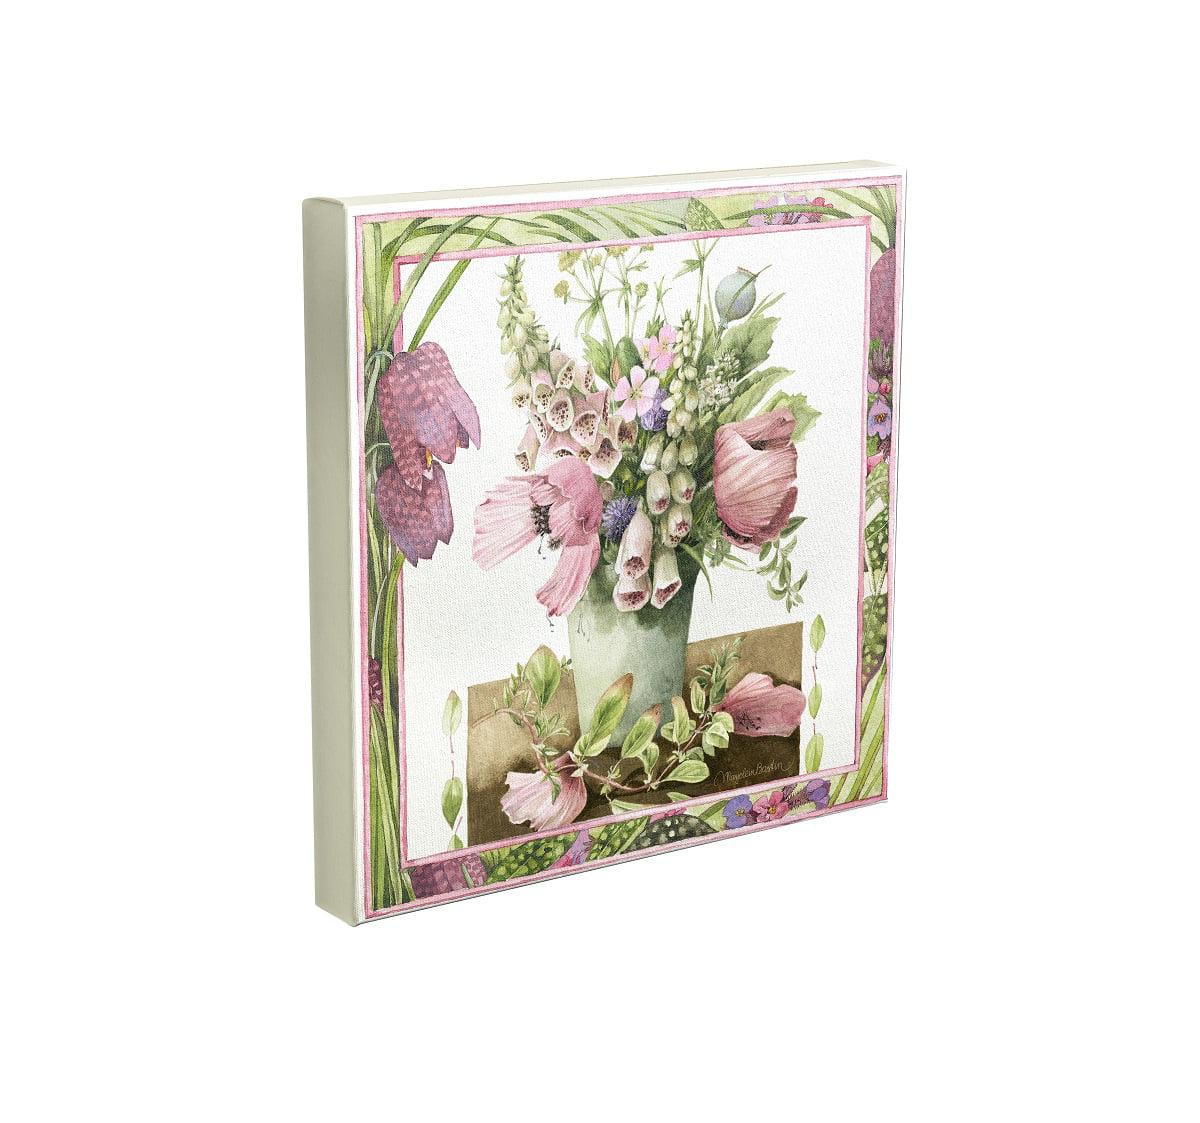 Marjolein Bastin Birdhouse Bouquet 10 x 10 Gallery Wrapped Canvas